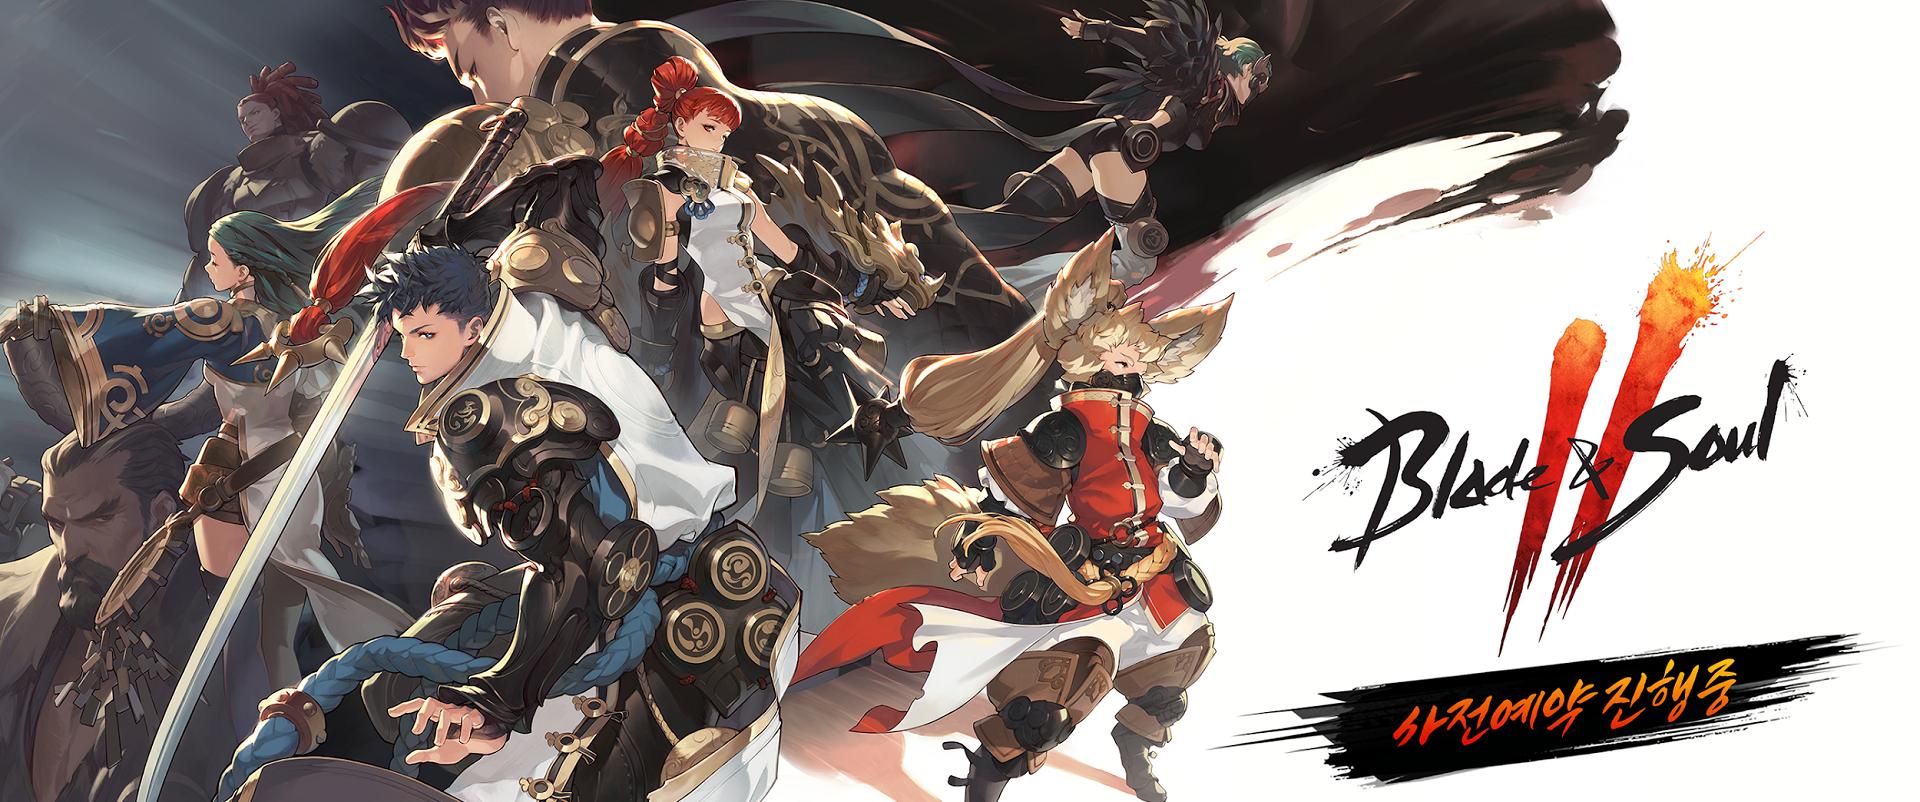 Blade Soul 2 1620221 2